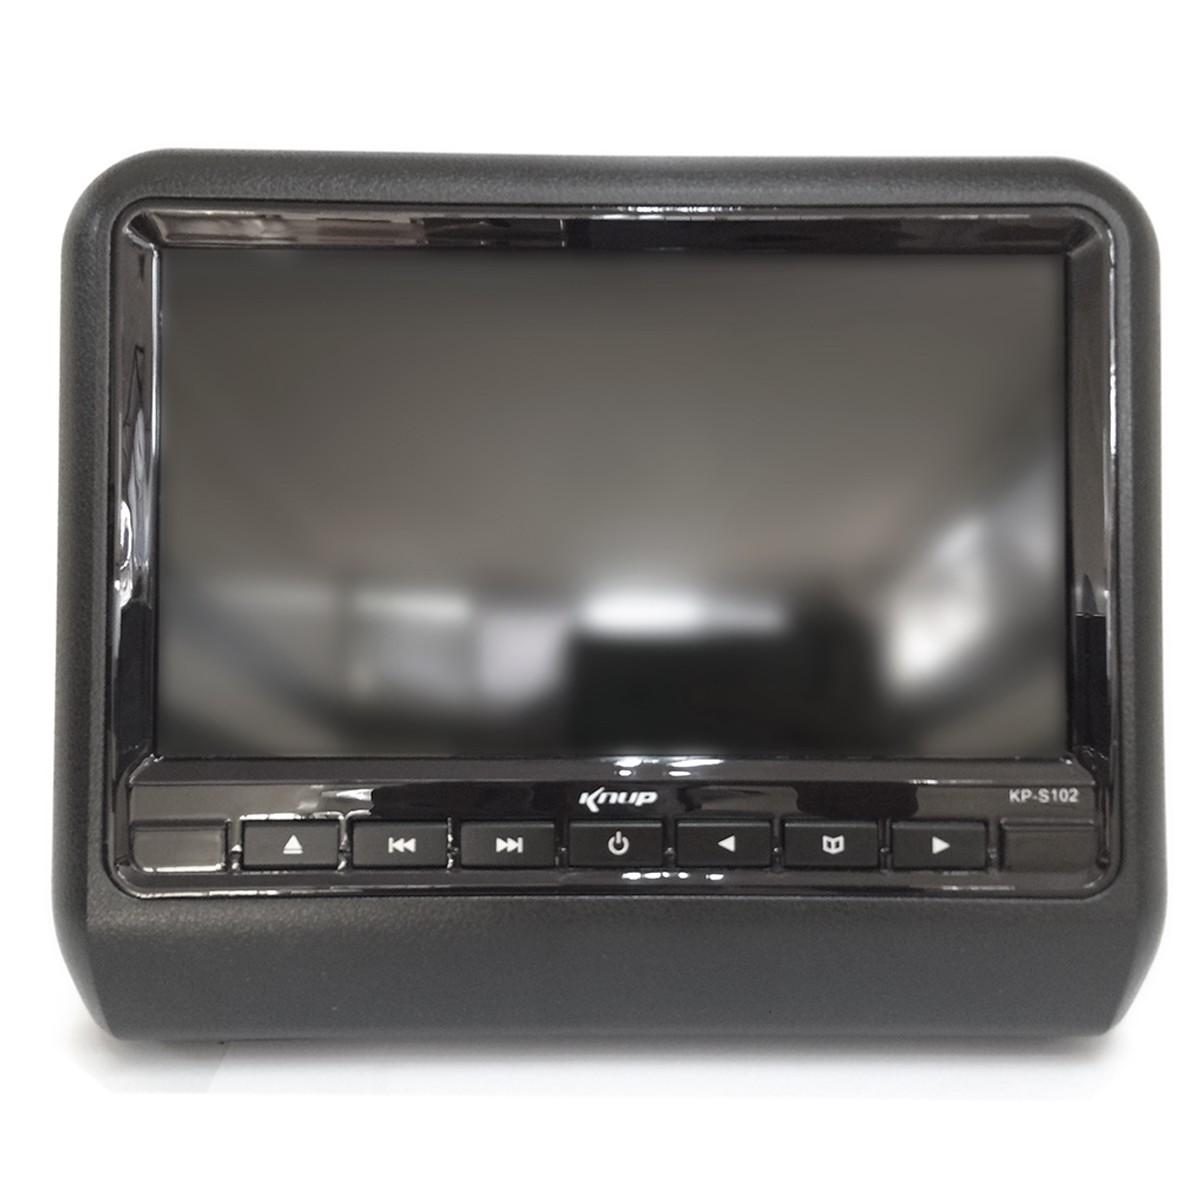 "Kit DVD Automotivo Knup KP-S102 C/ 2 Telas de 9"" TFT LED RGB 800X480 (SEMI-NOVO)"